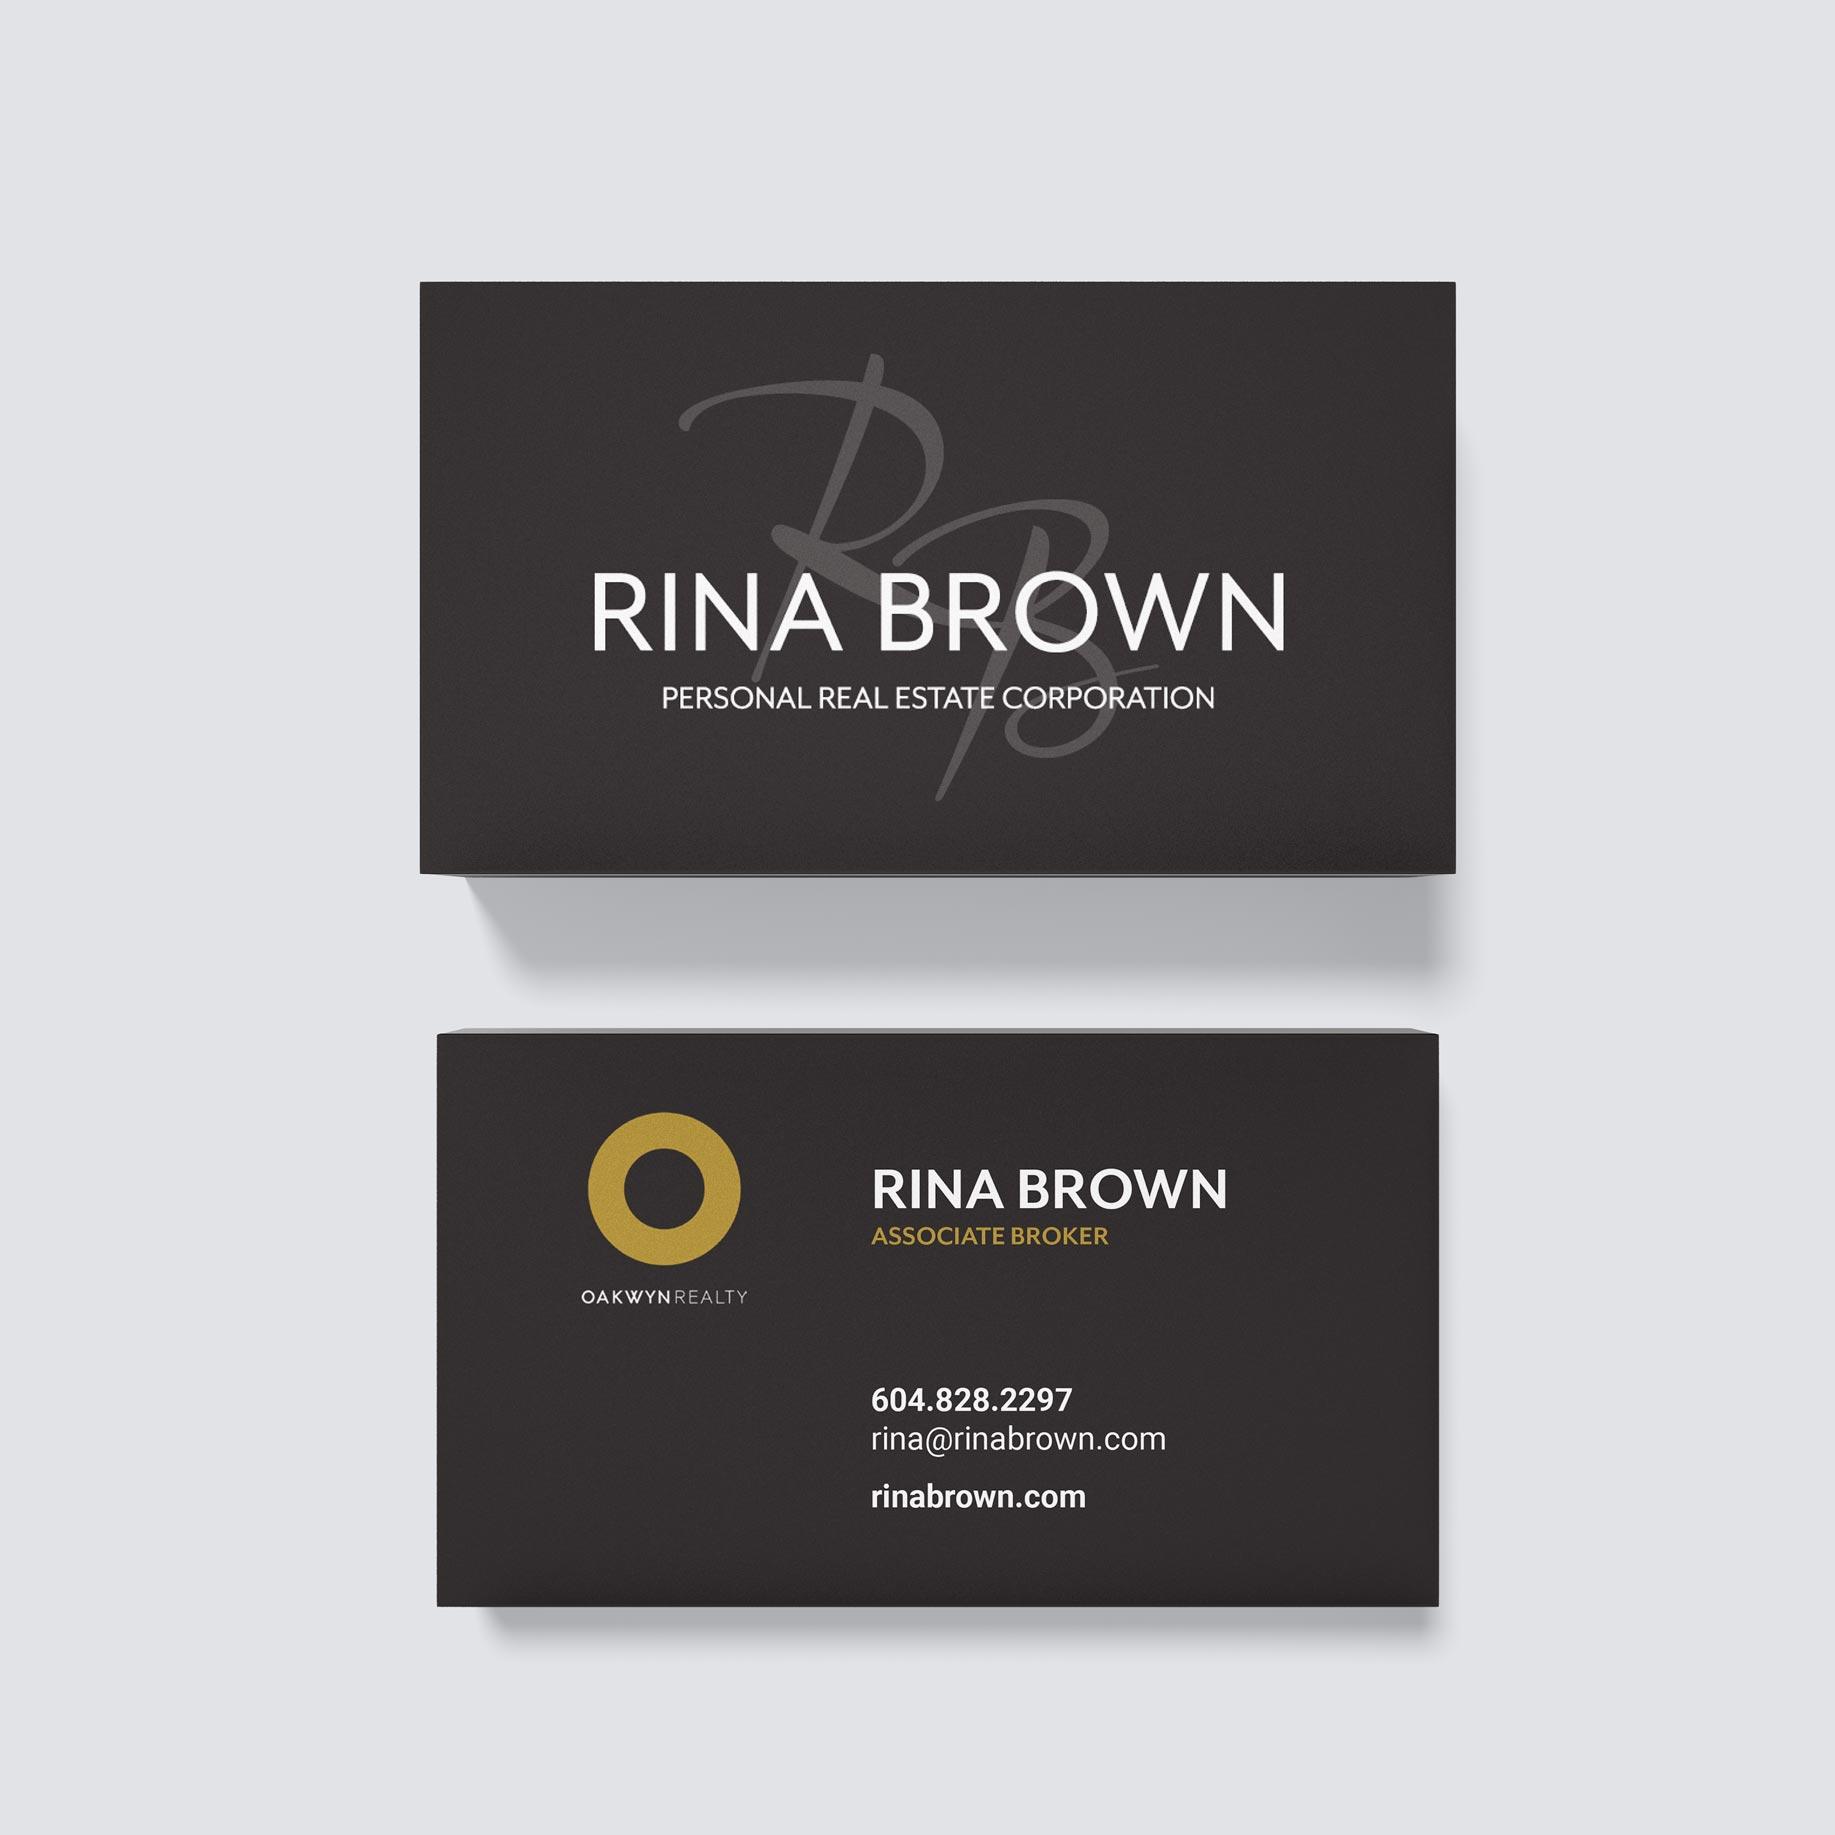 Business Card by ALina Demidova